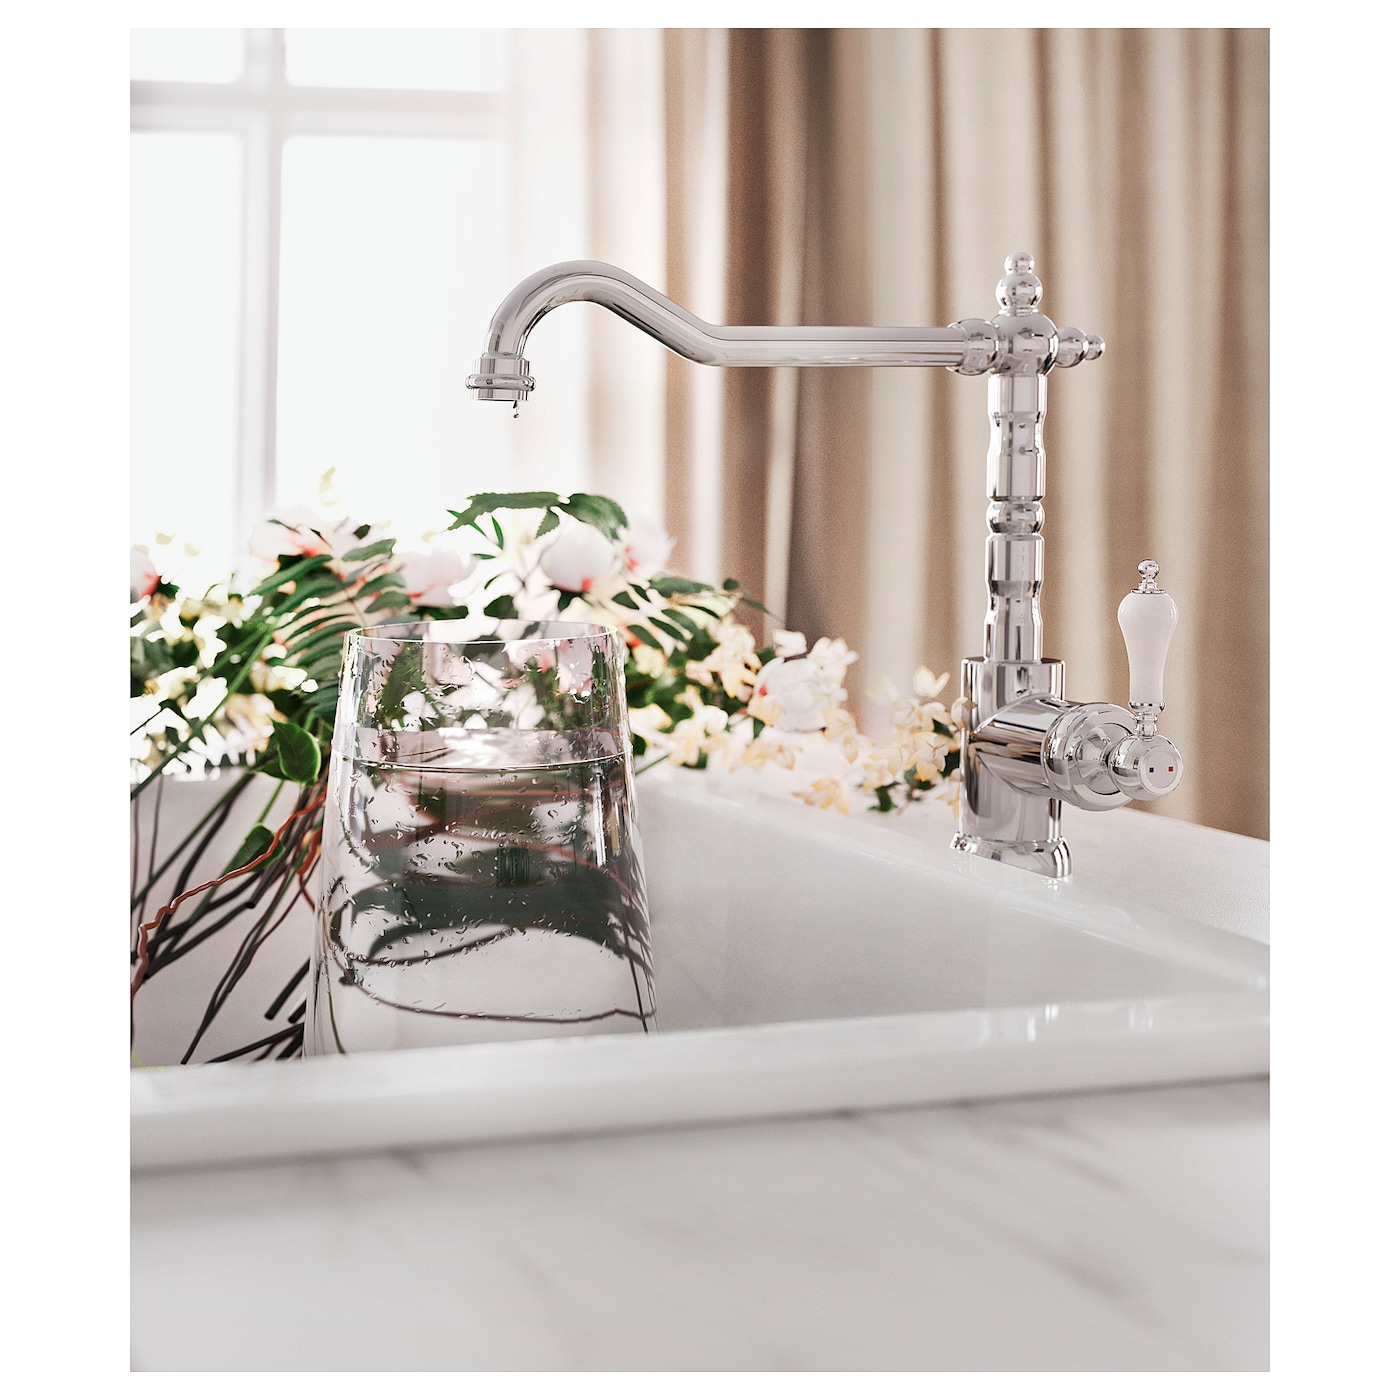 GLITTRAN Kitchen mixer tap, chrome-plated